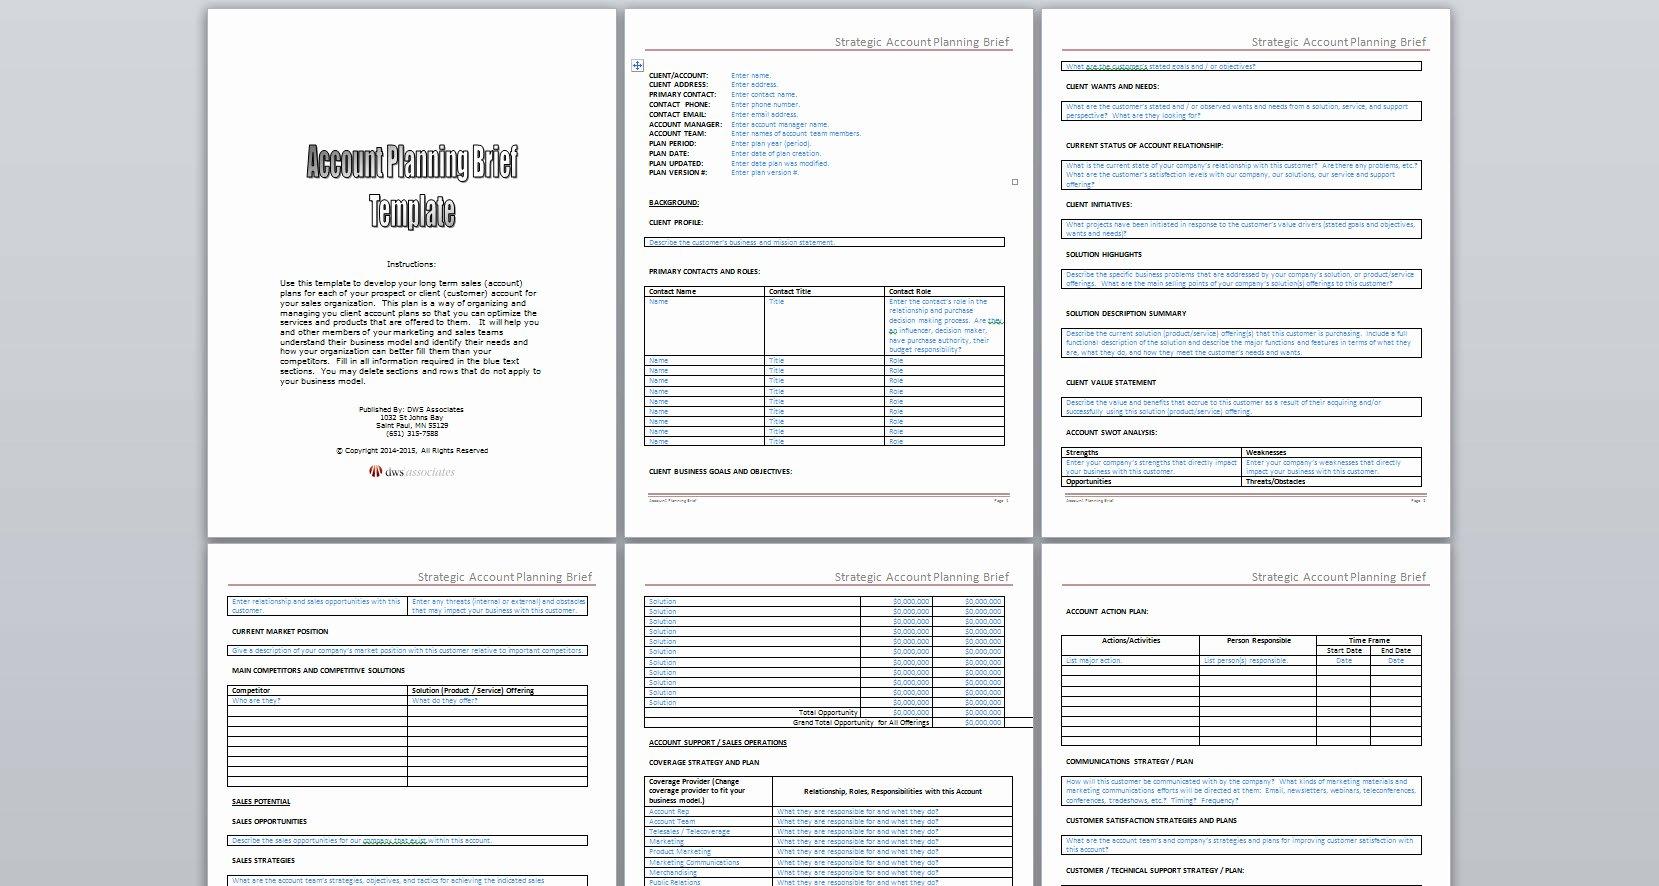 Strategic Account Plan Template Lovely Dws associates Strategic Account Planning Brief Template